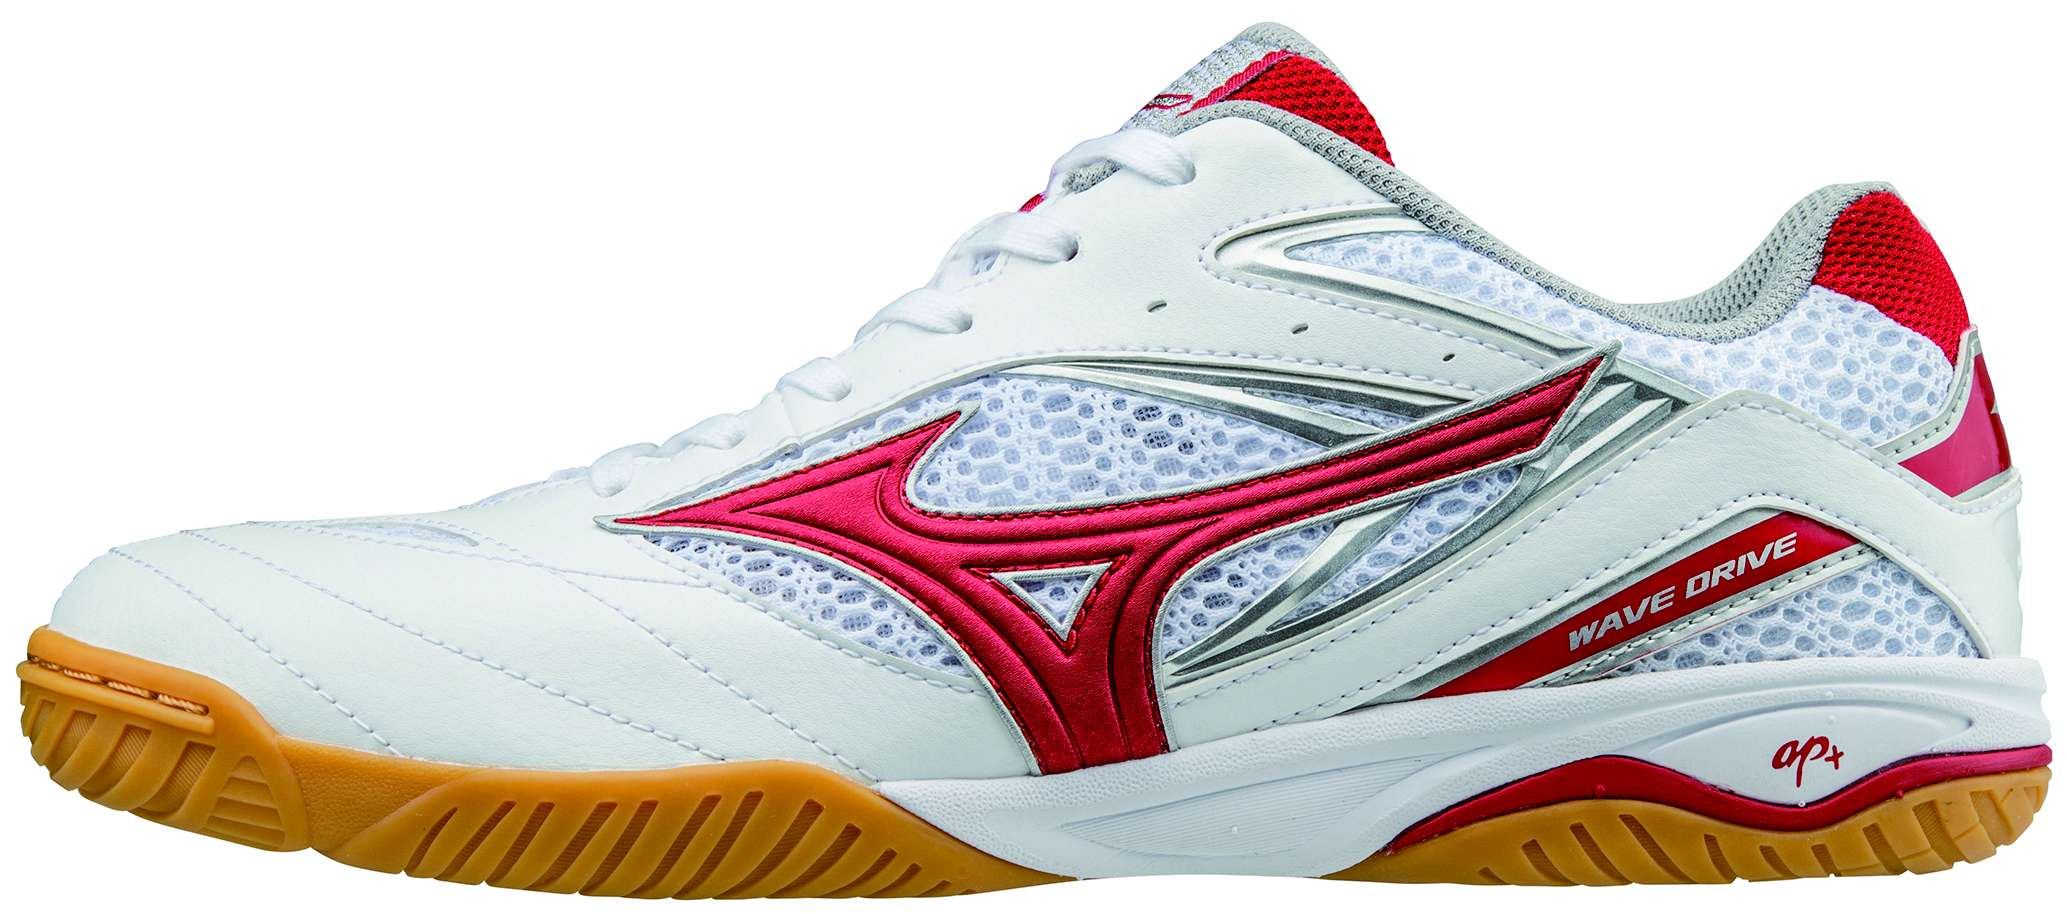 Mizuno Schuh 8 Weißrot Wave Drive PXikZu